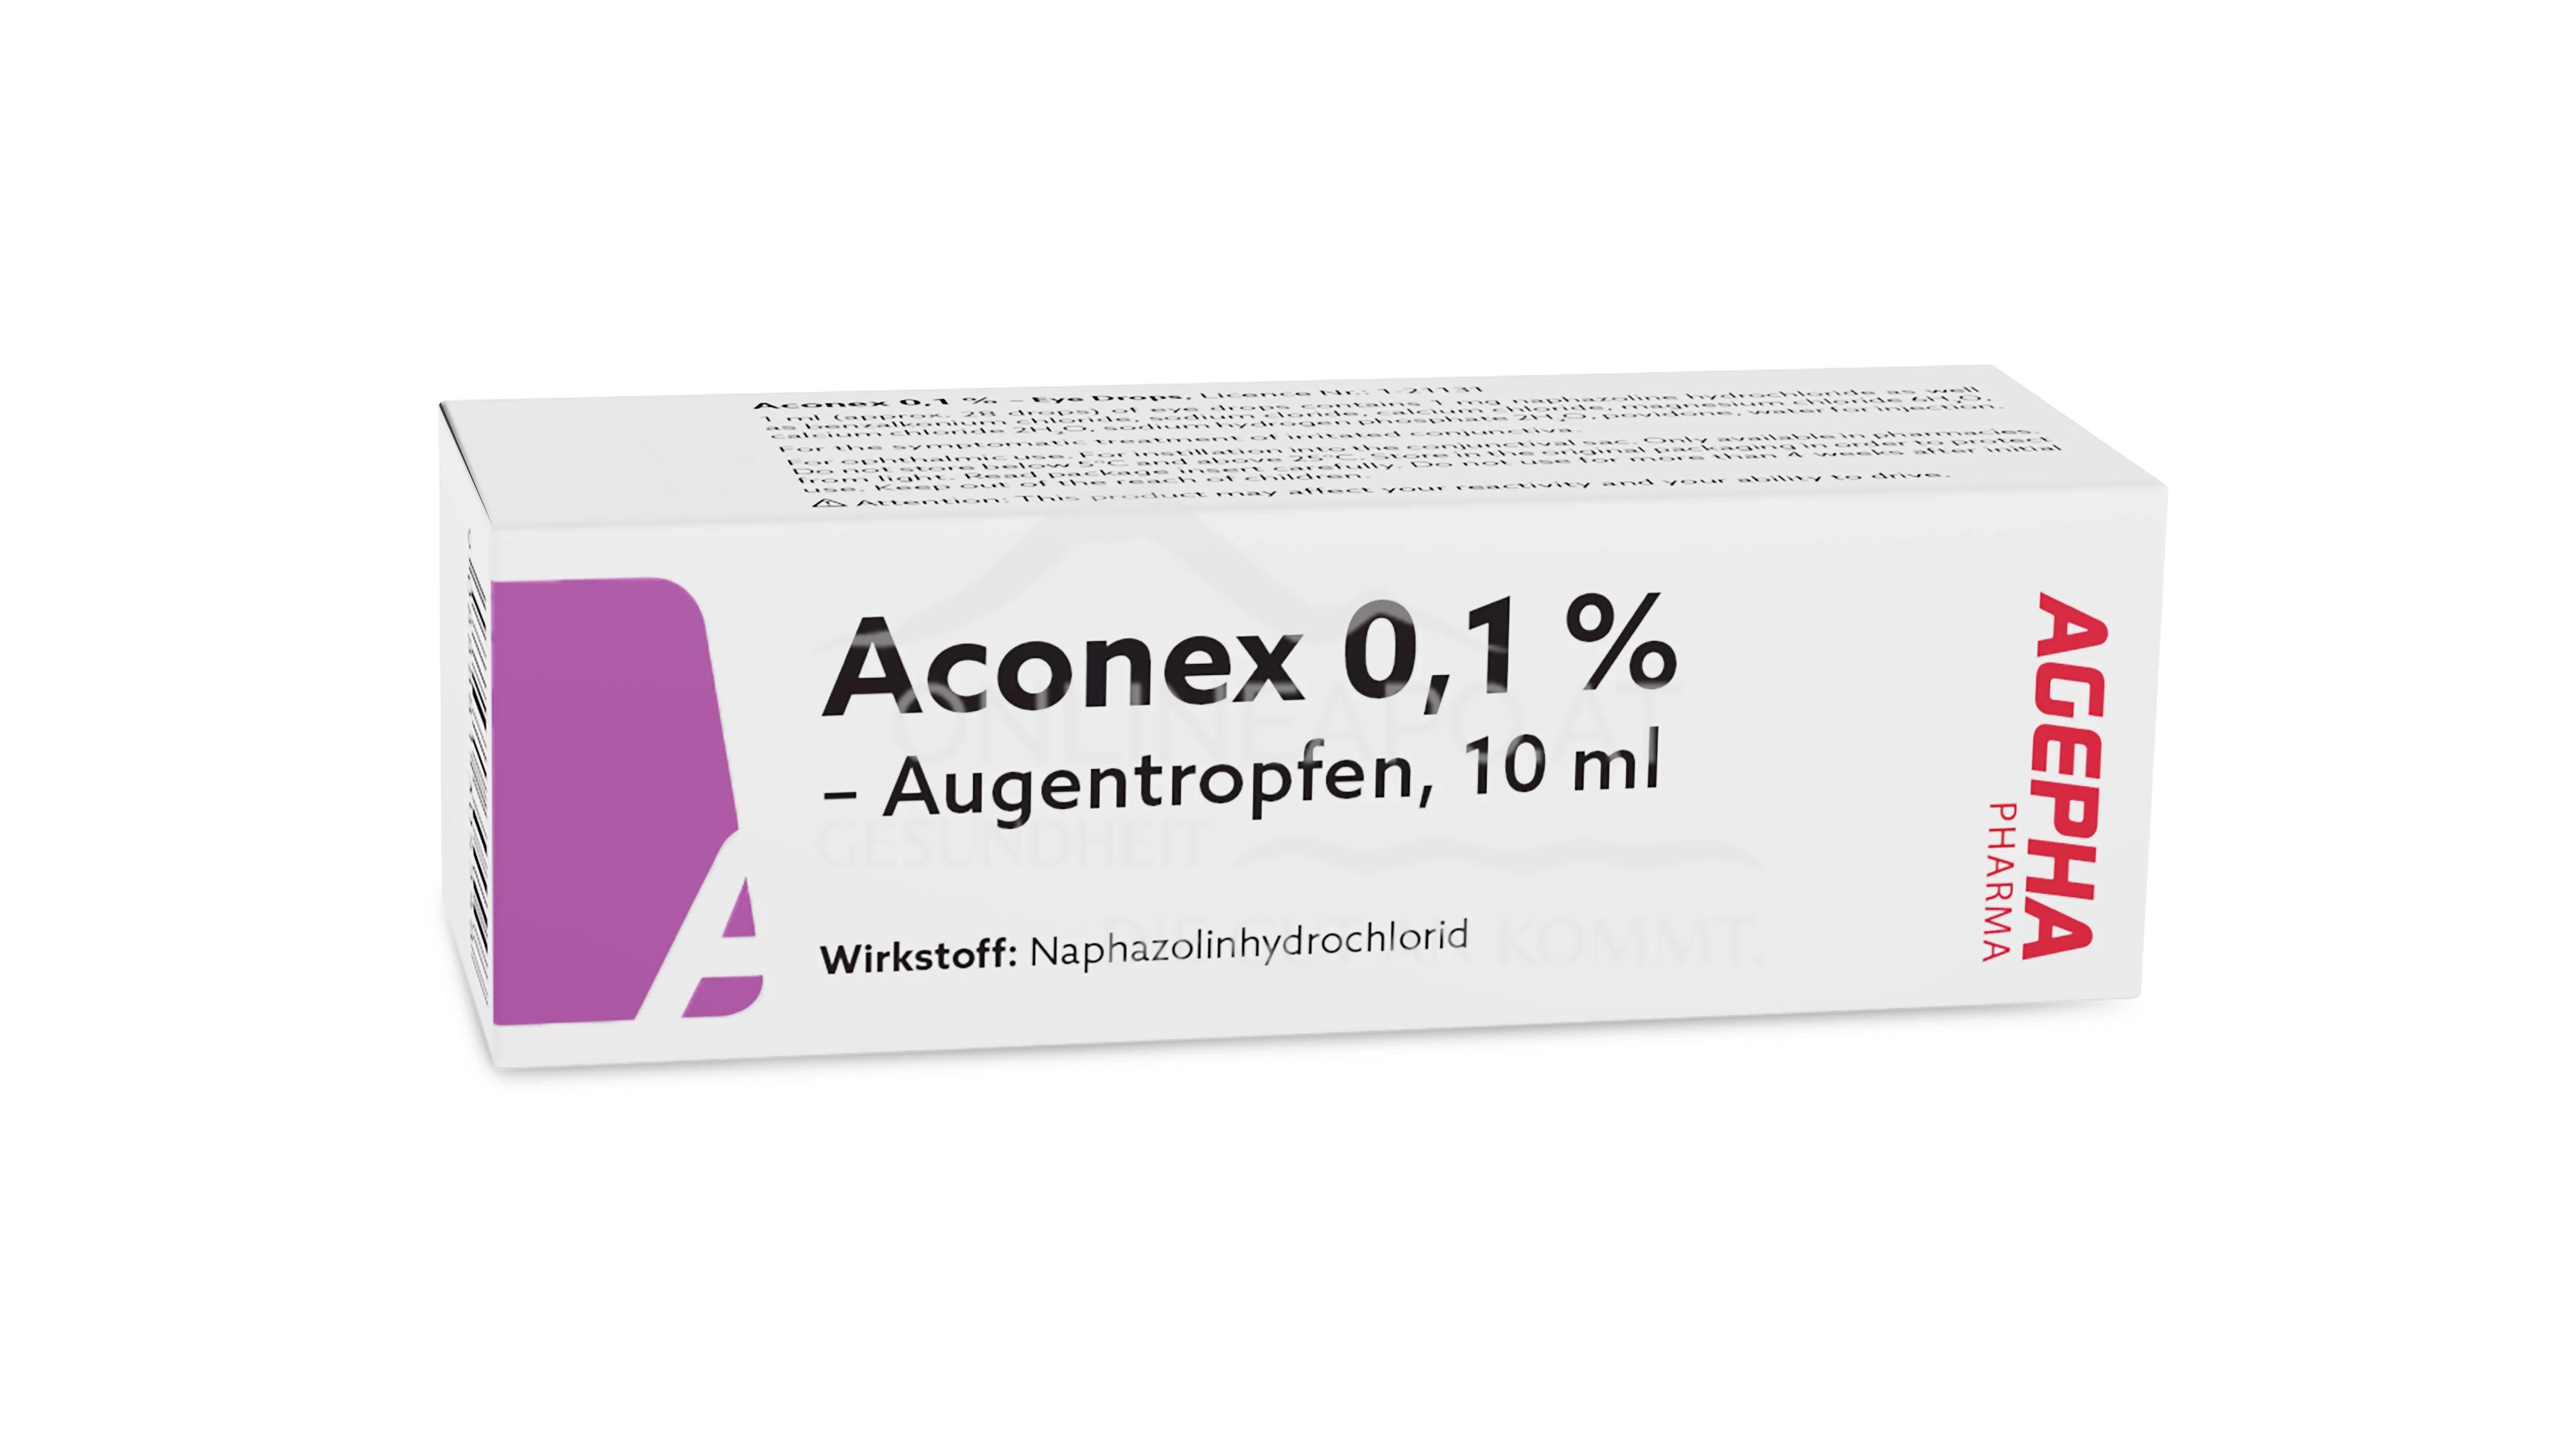 Aconex 0,1% Augentropfen